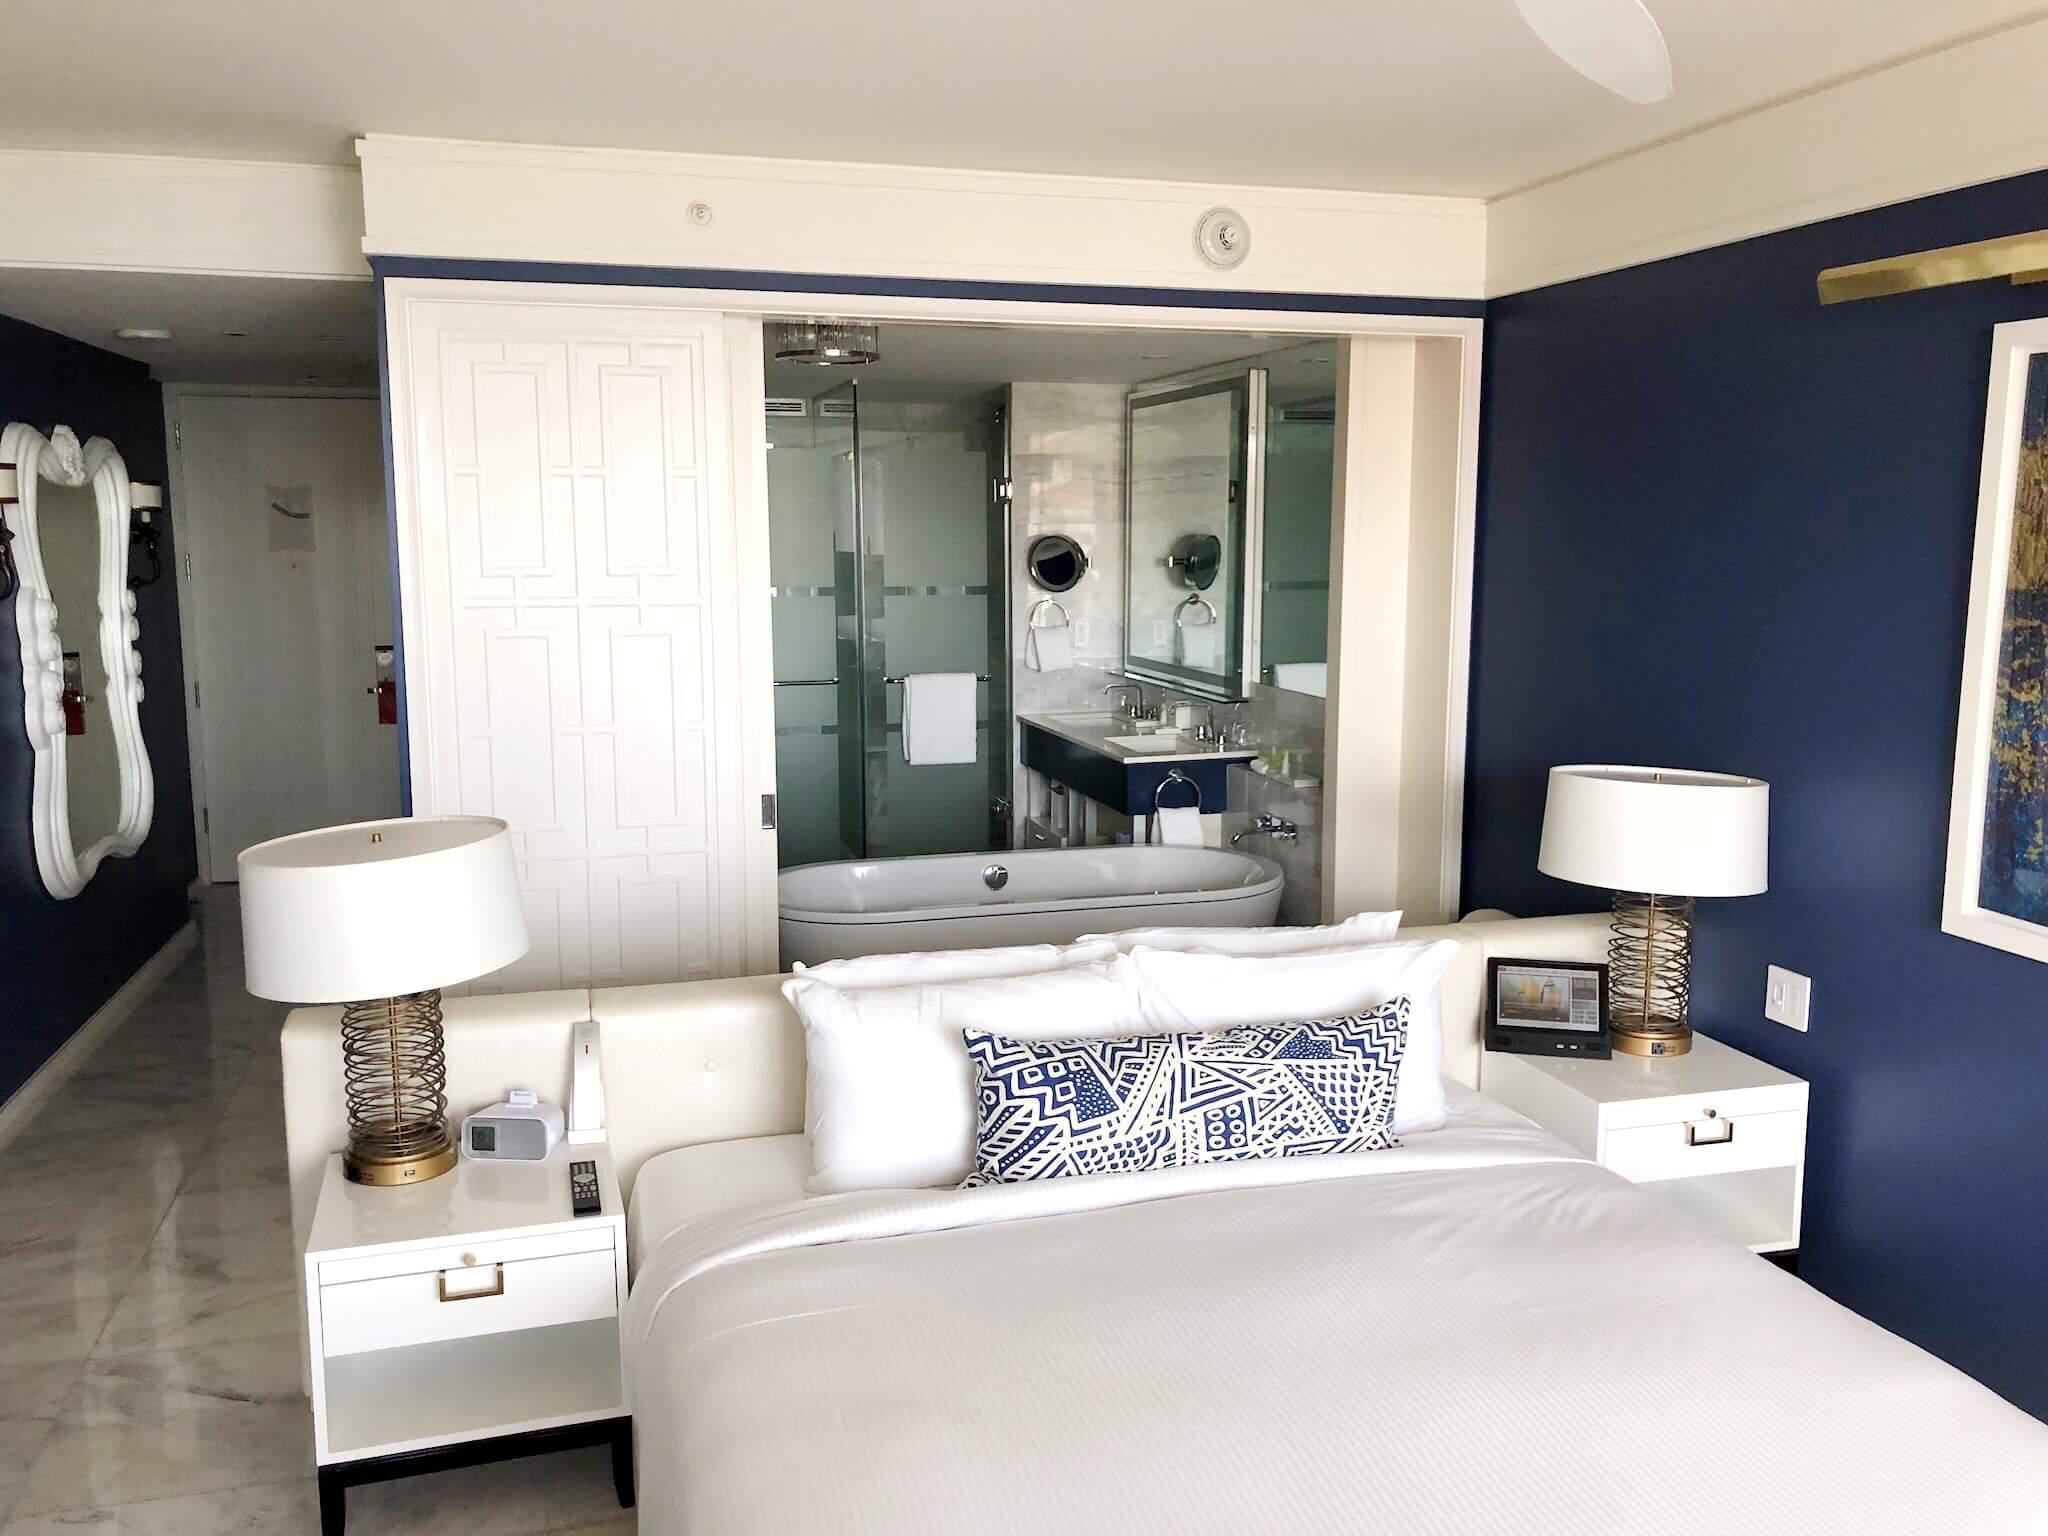 Our Stay At The Baha Mar Resort In Nassau Bahamas Baha